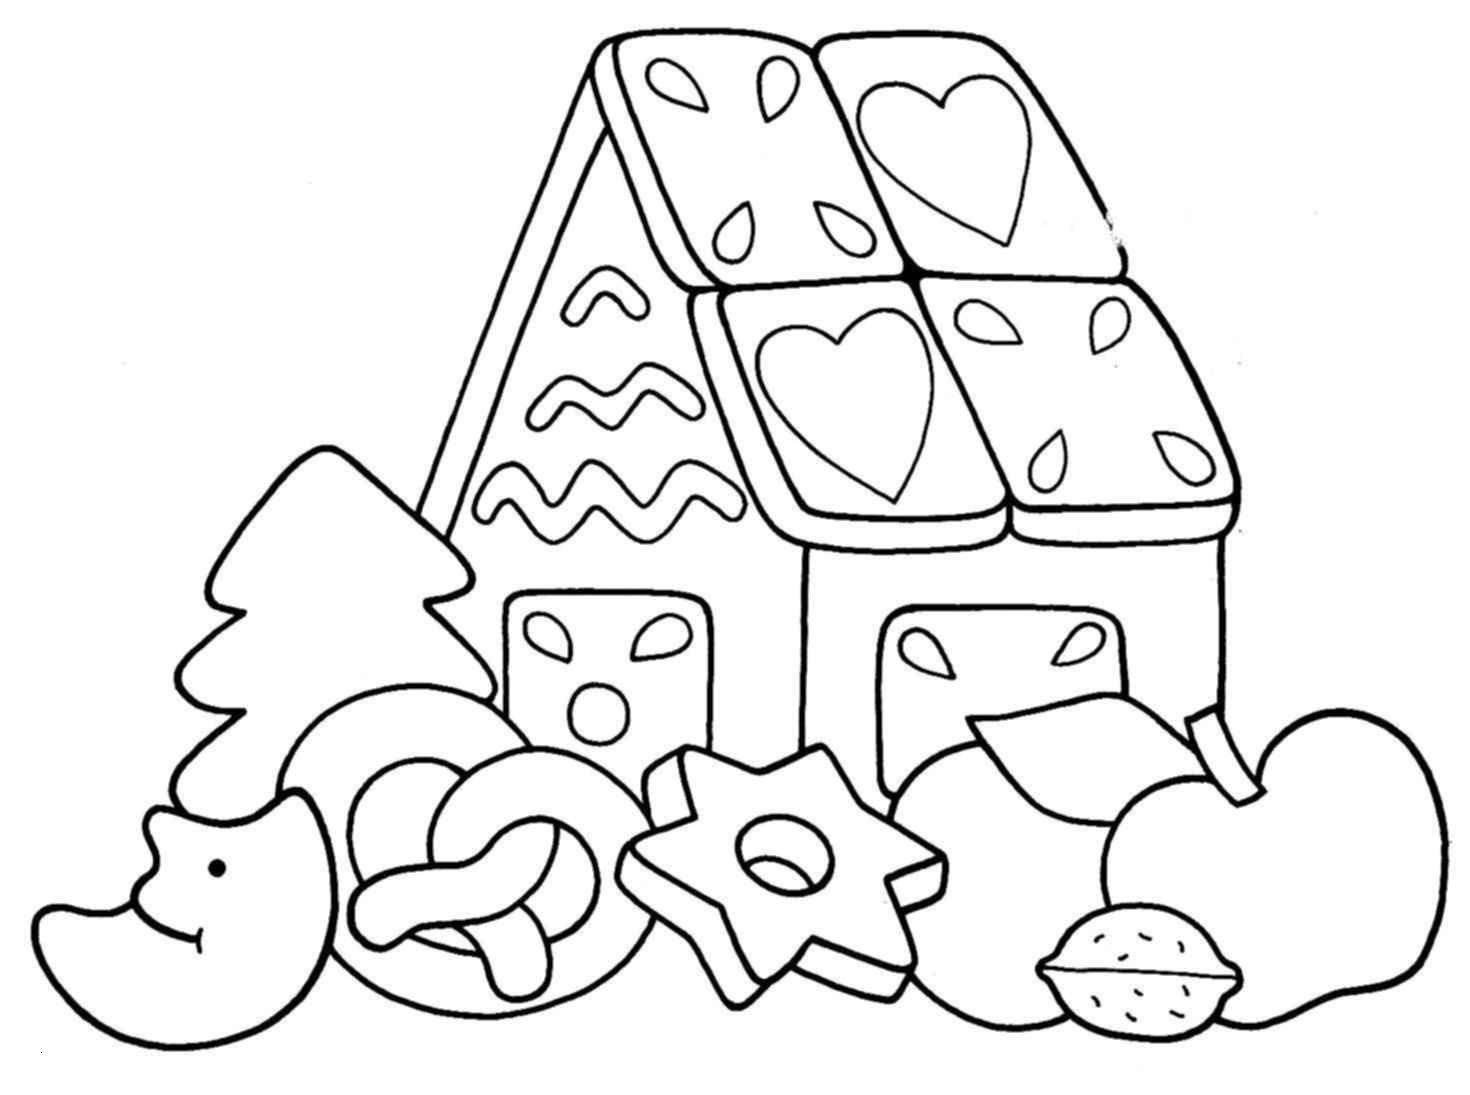 Mini Maus Ausmalbilder Frisch 30 Lovely Princess Minnie Mouse Coloring Pages Inspirierend Mini Sammlung